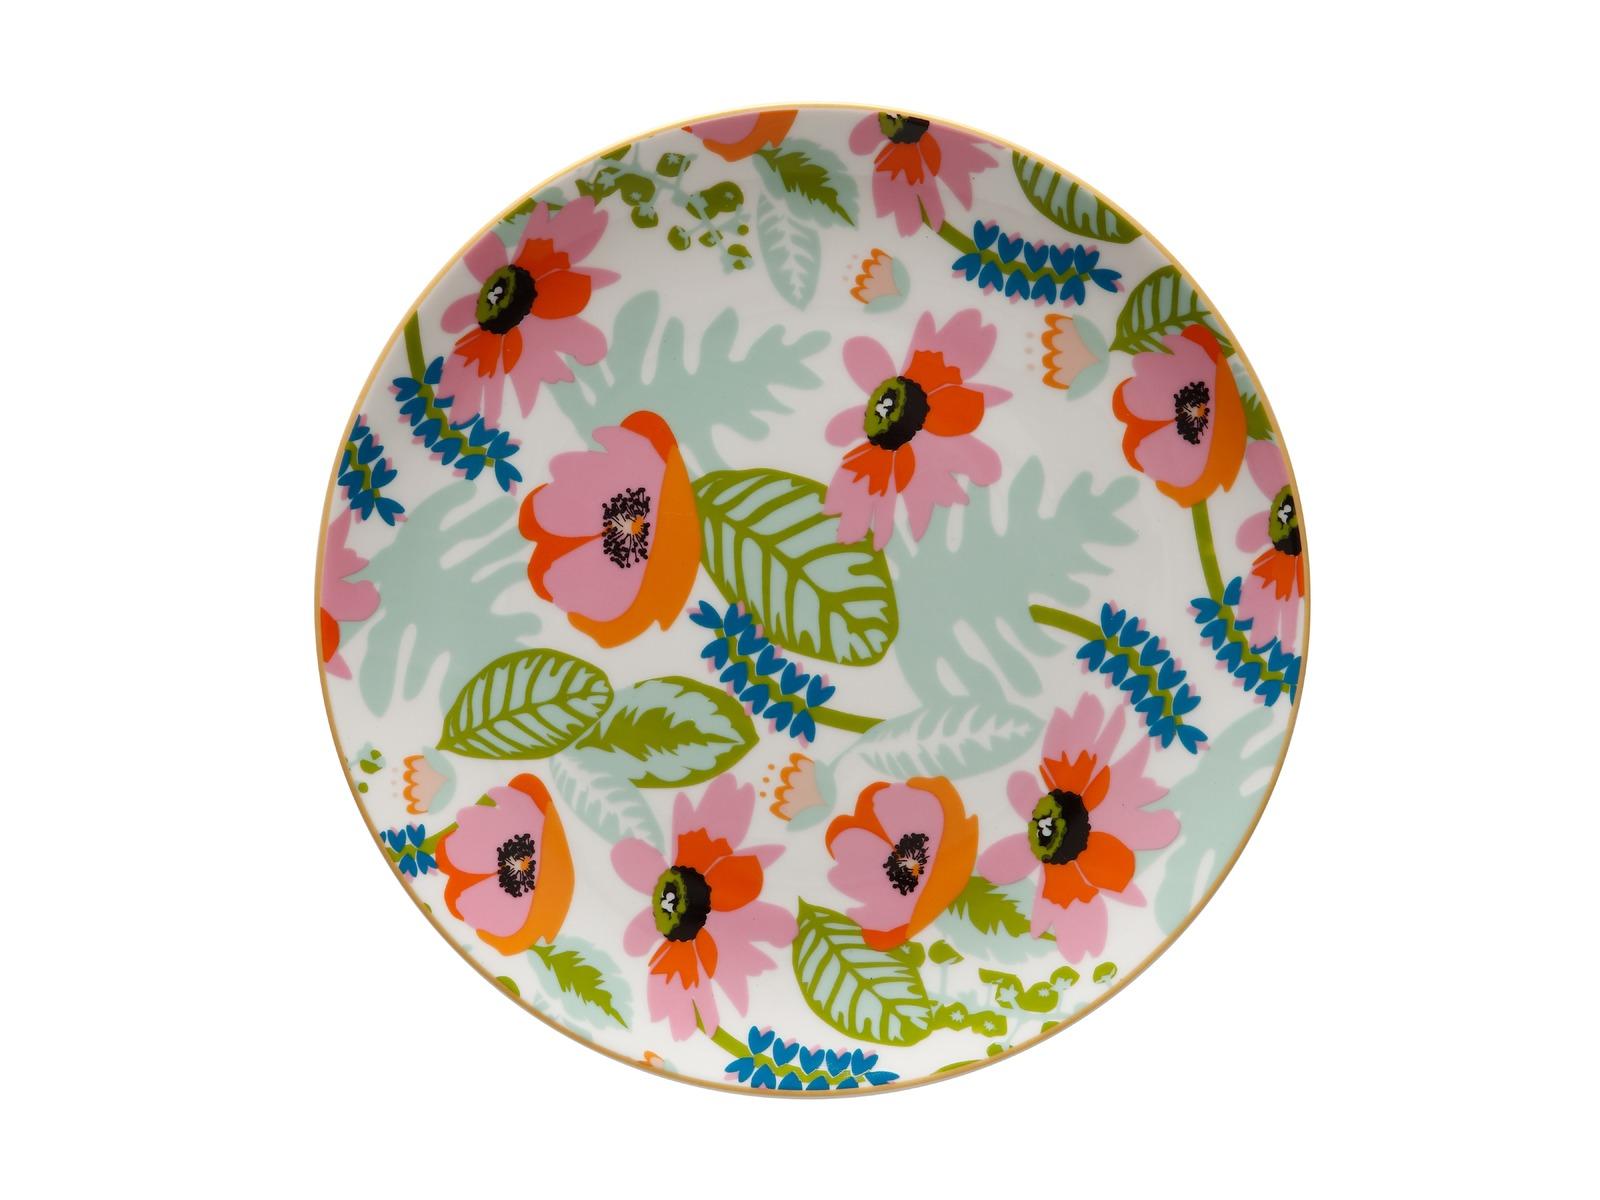 Maxwell & Williams: Teas & C's Glastonbury Plate - Alpinia White image